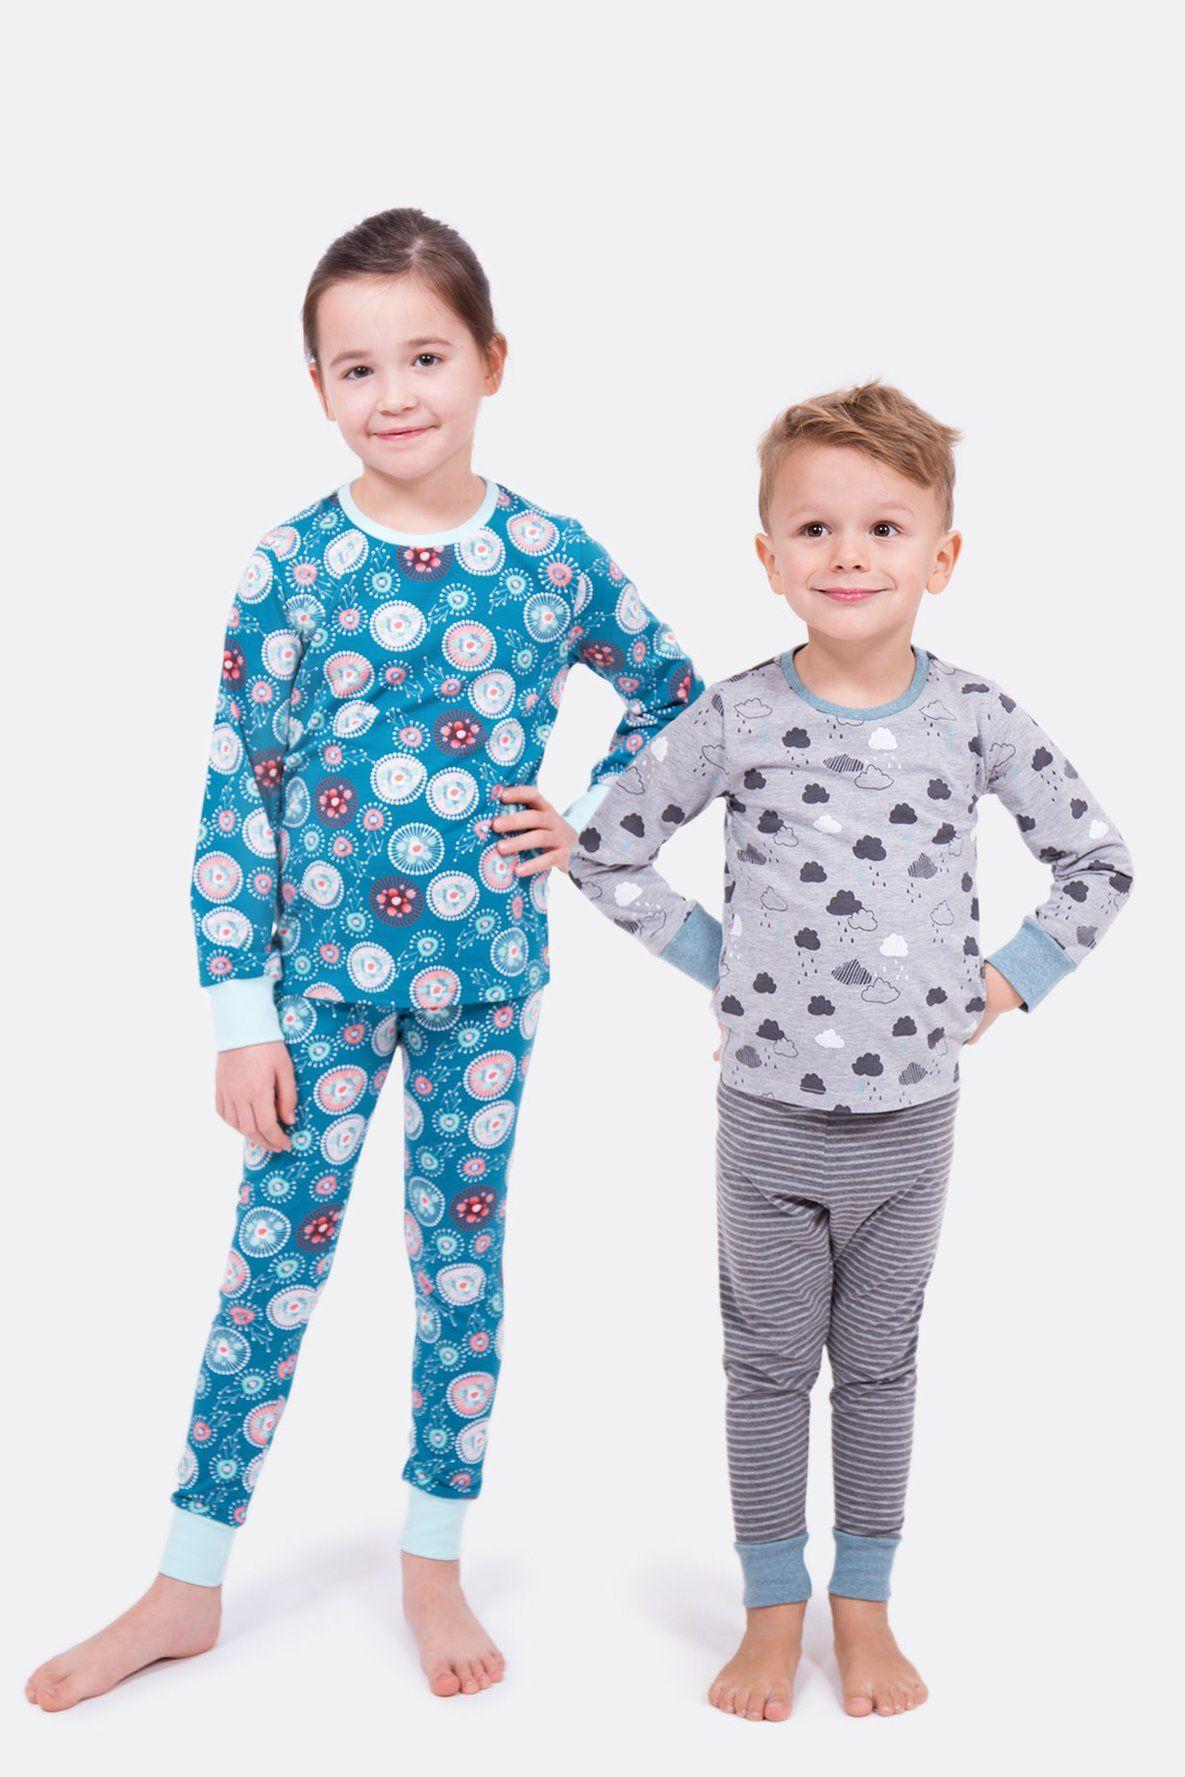 schnittmuster kinder schlafanzug jungen mädchen nähen